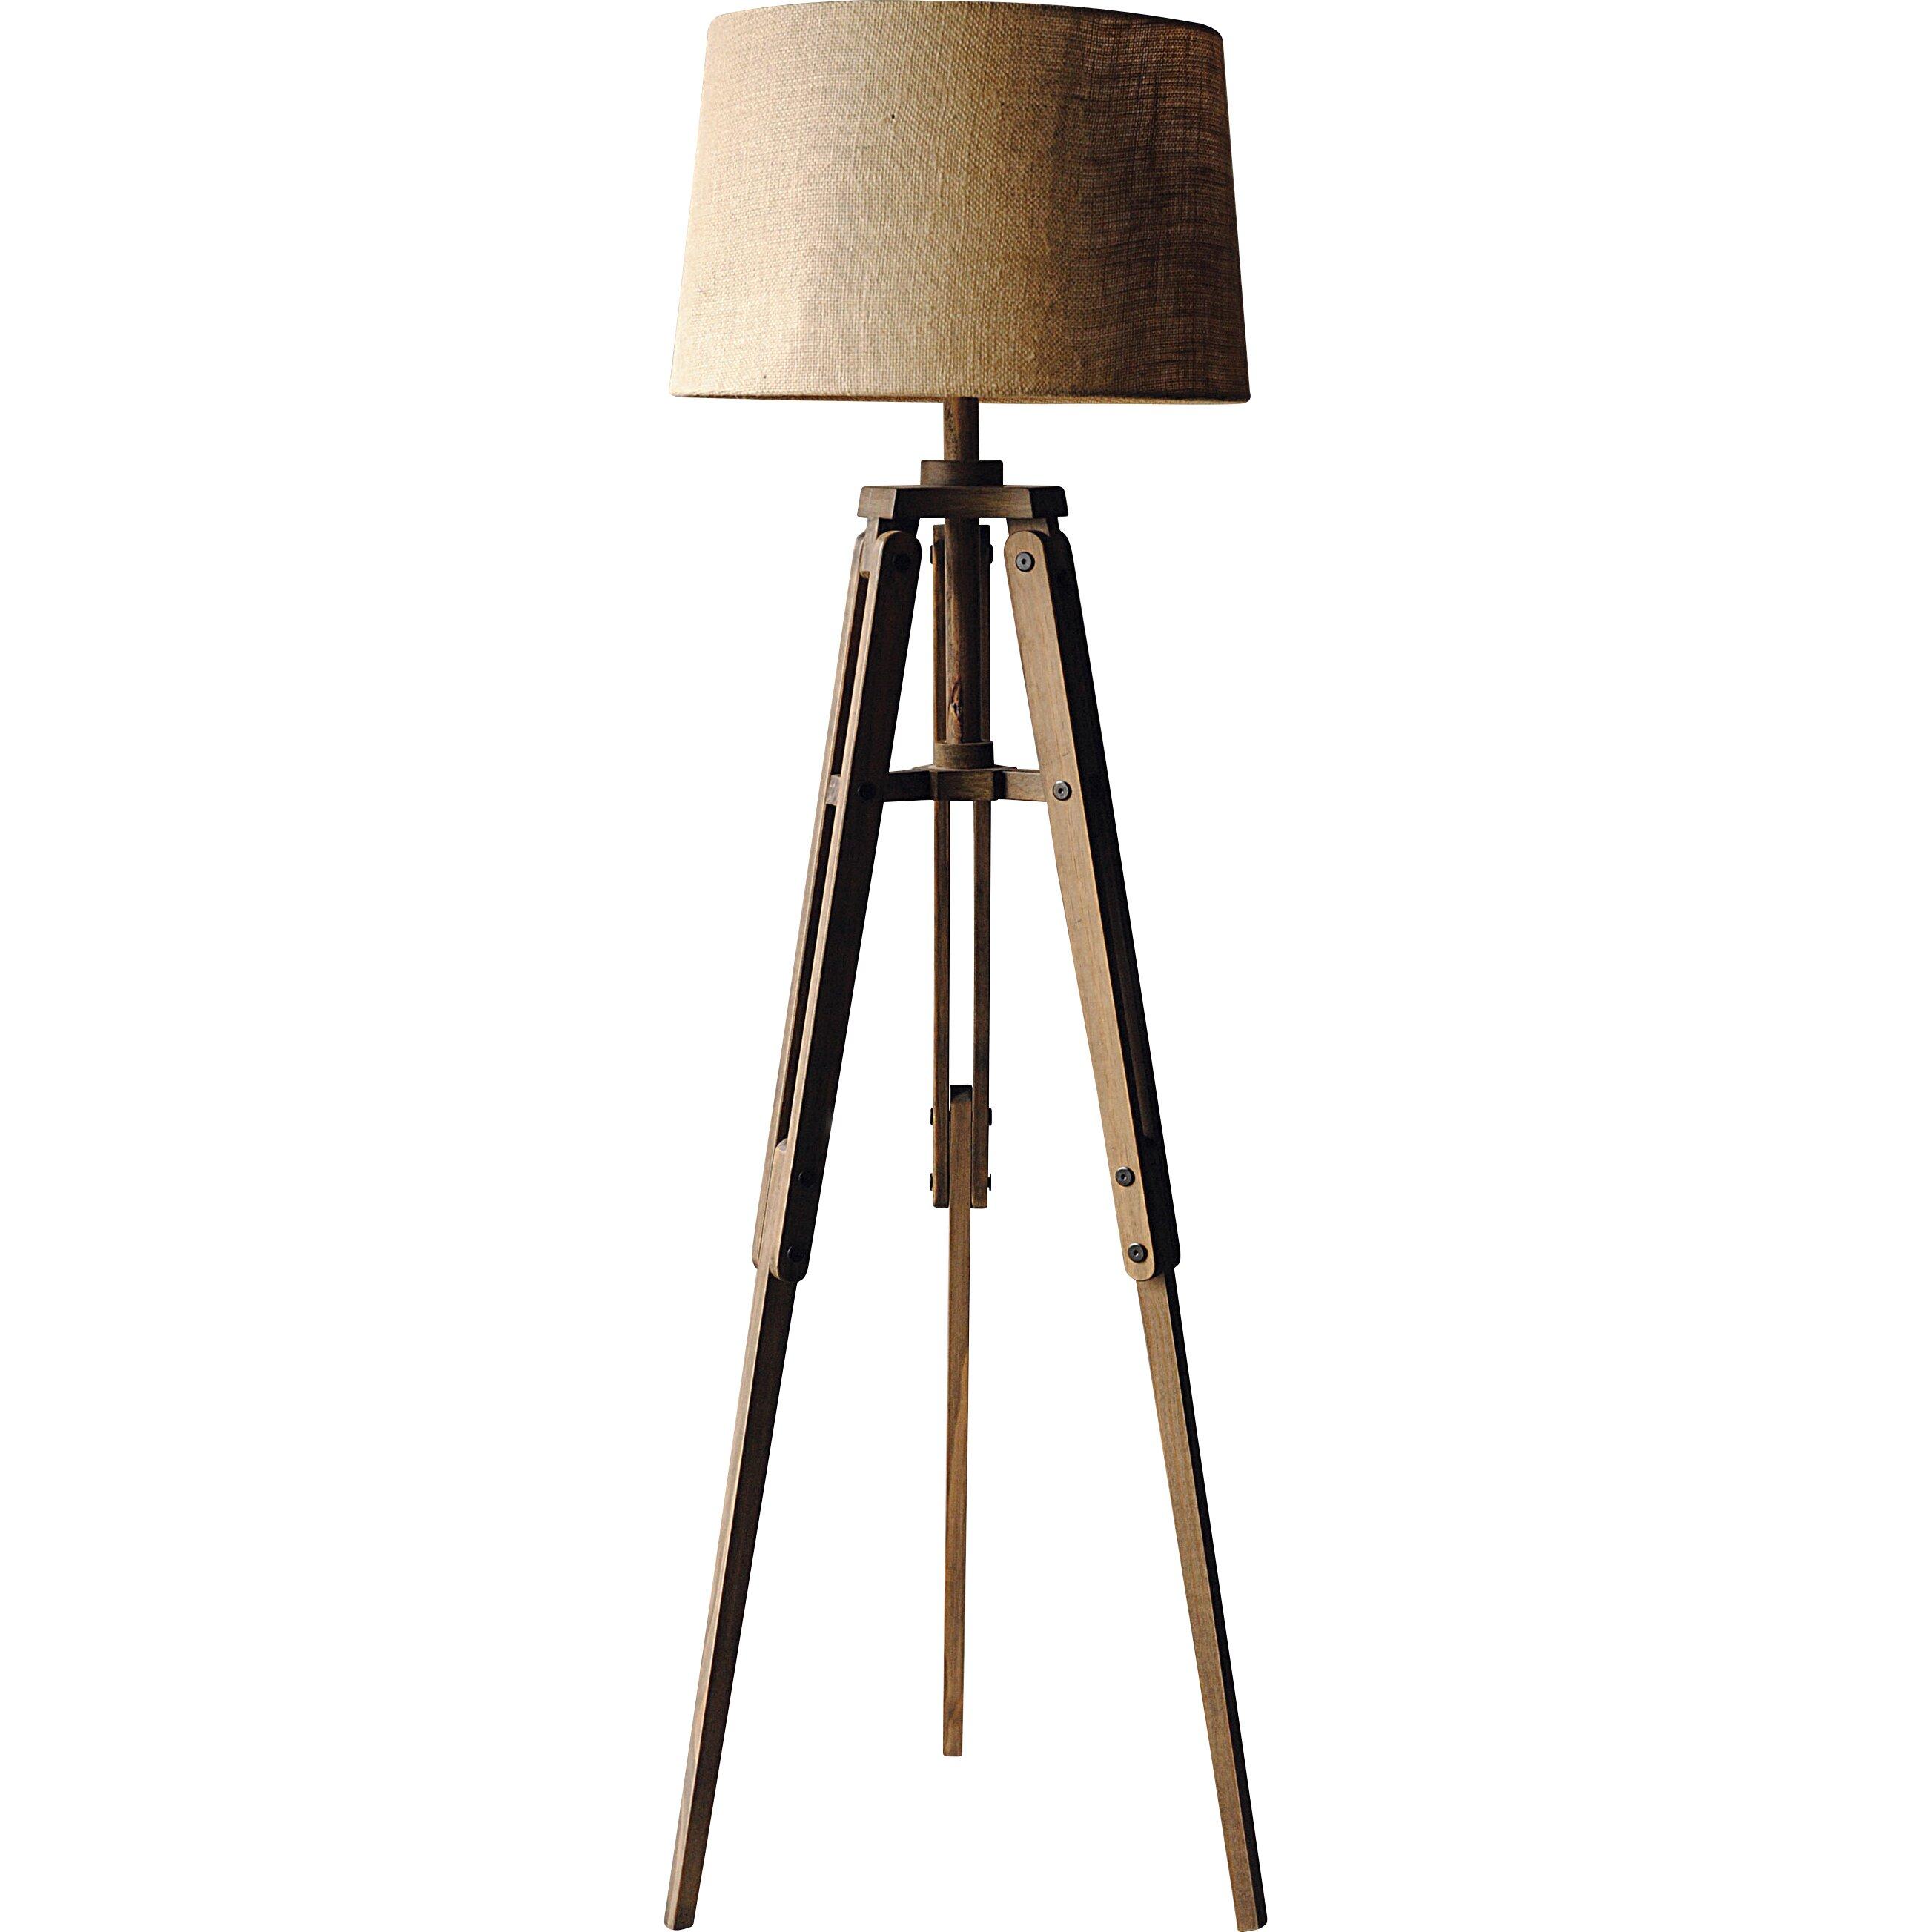 Turn of the century 6225quot tripod floor lamp wayfair for Wayfair wood floor lamp